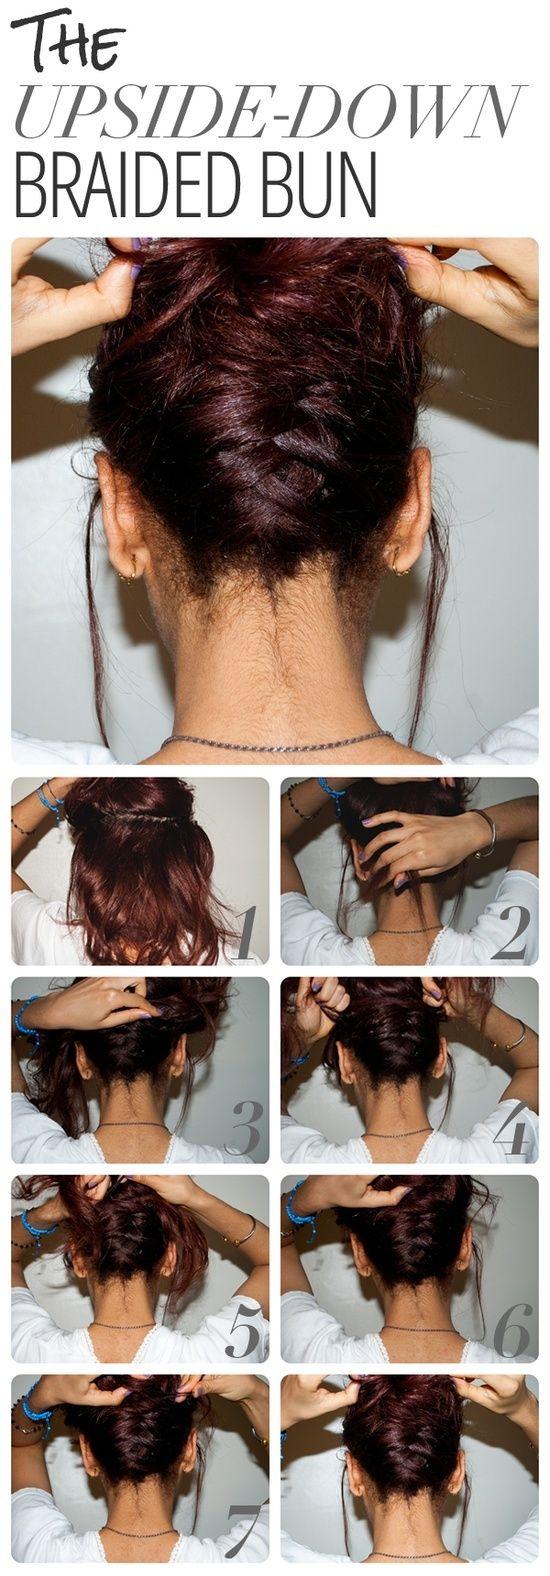 diy prom hairstyles : DIY Upside Down Braided Bun Hairstyle beauty tips Pinterest